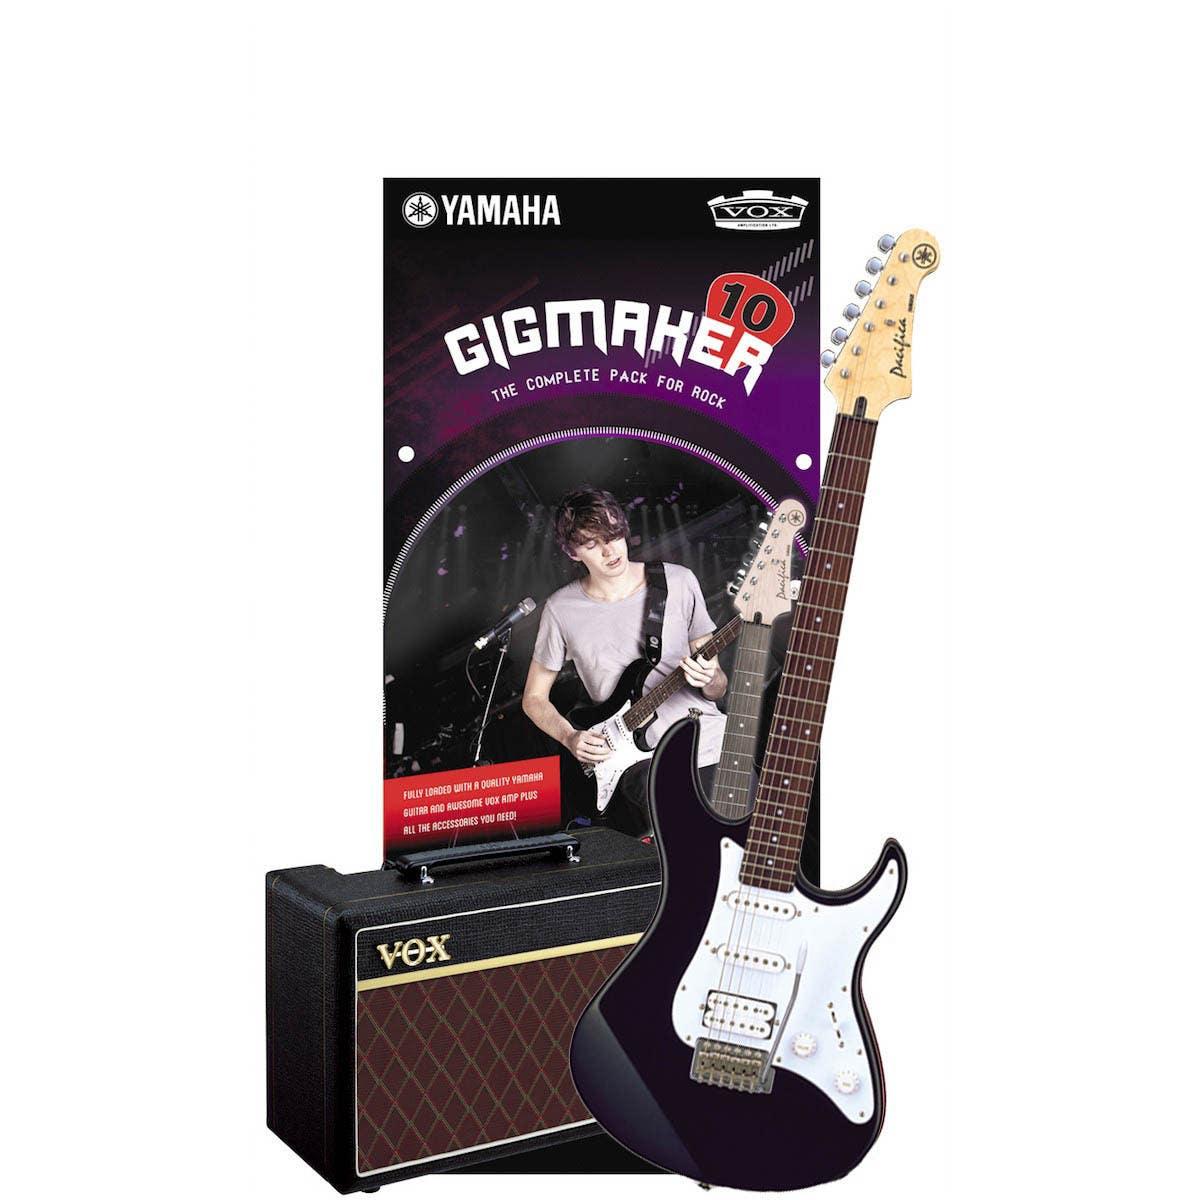 Yamaha Gigmaker10 Electric Guitar Starter Pack - Black